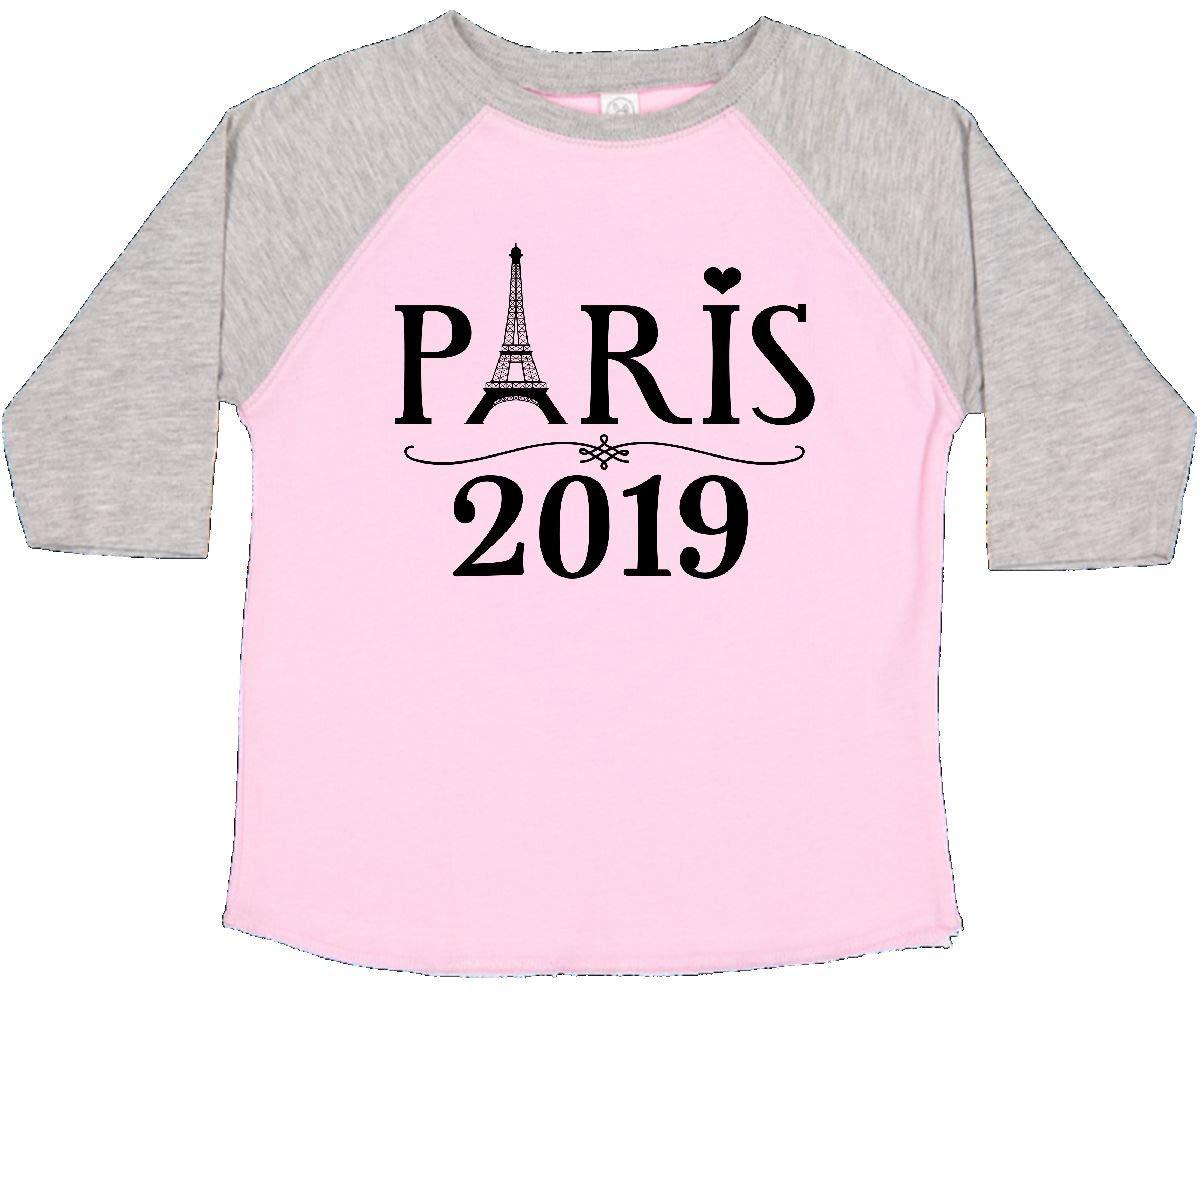 inktastic Paris France 2019 Vacation Trip Toddler T-Shirt